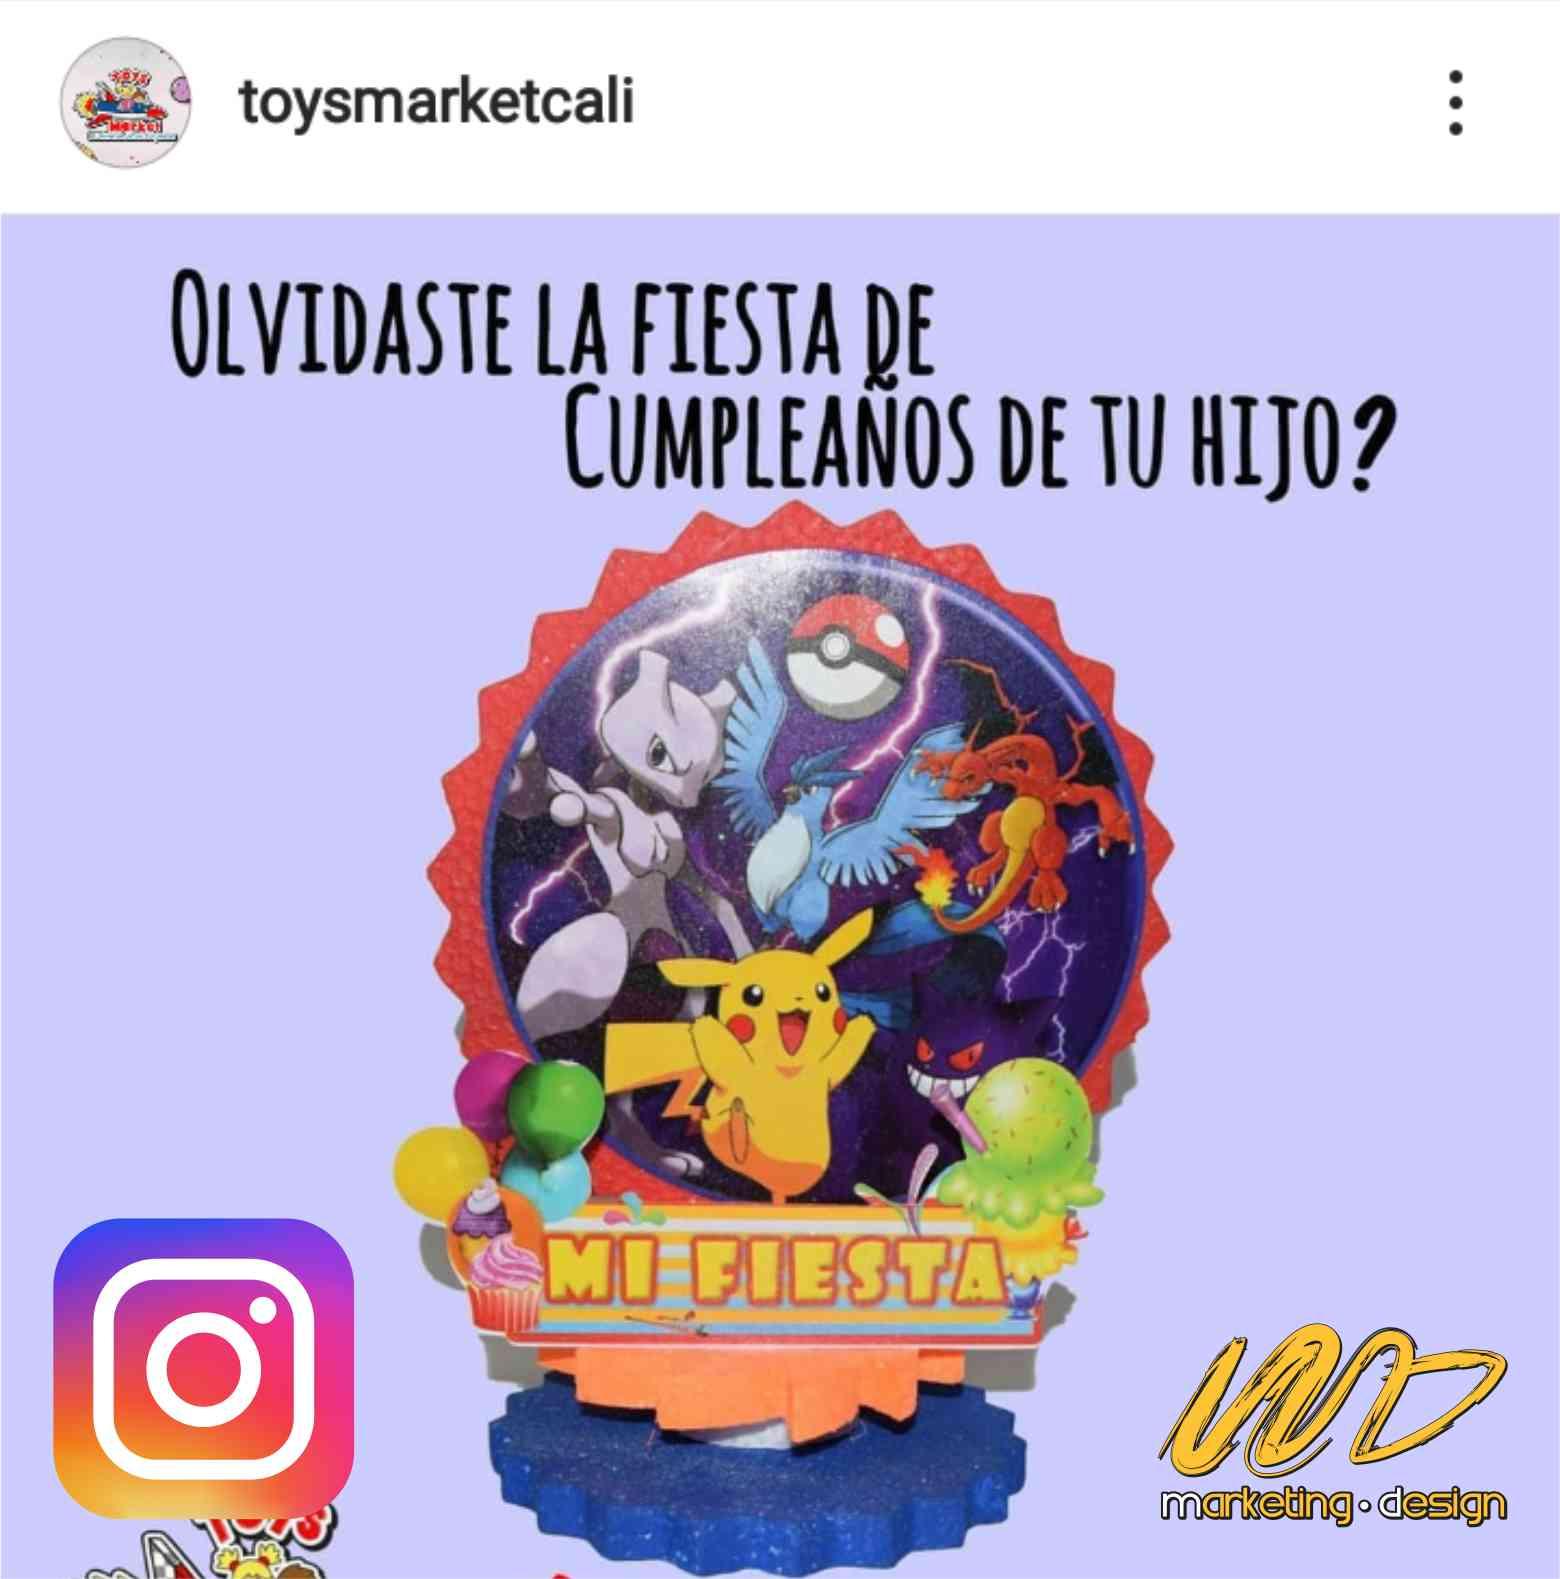 Clientes Instagram Marketing Design 1904